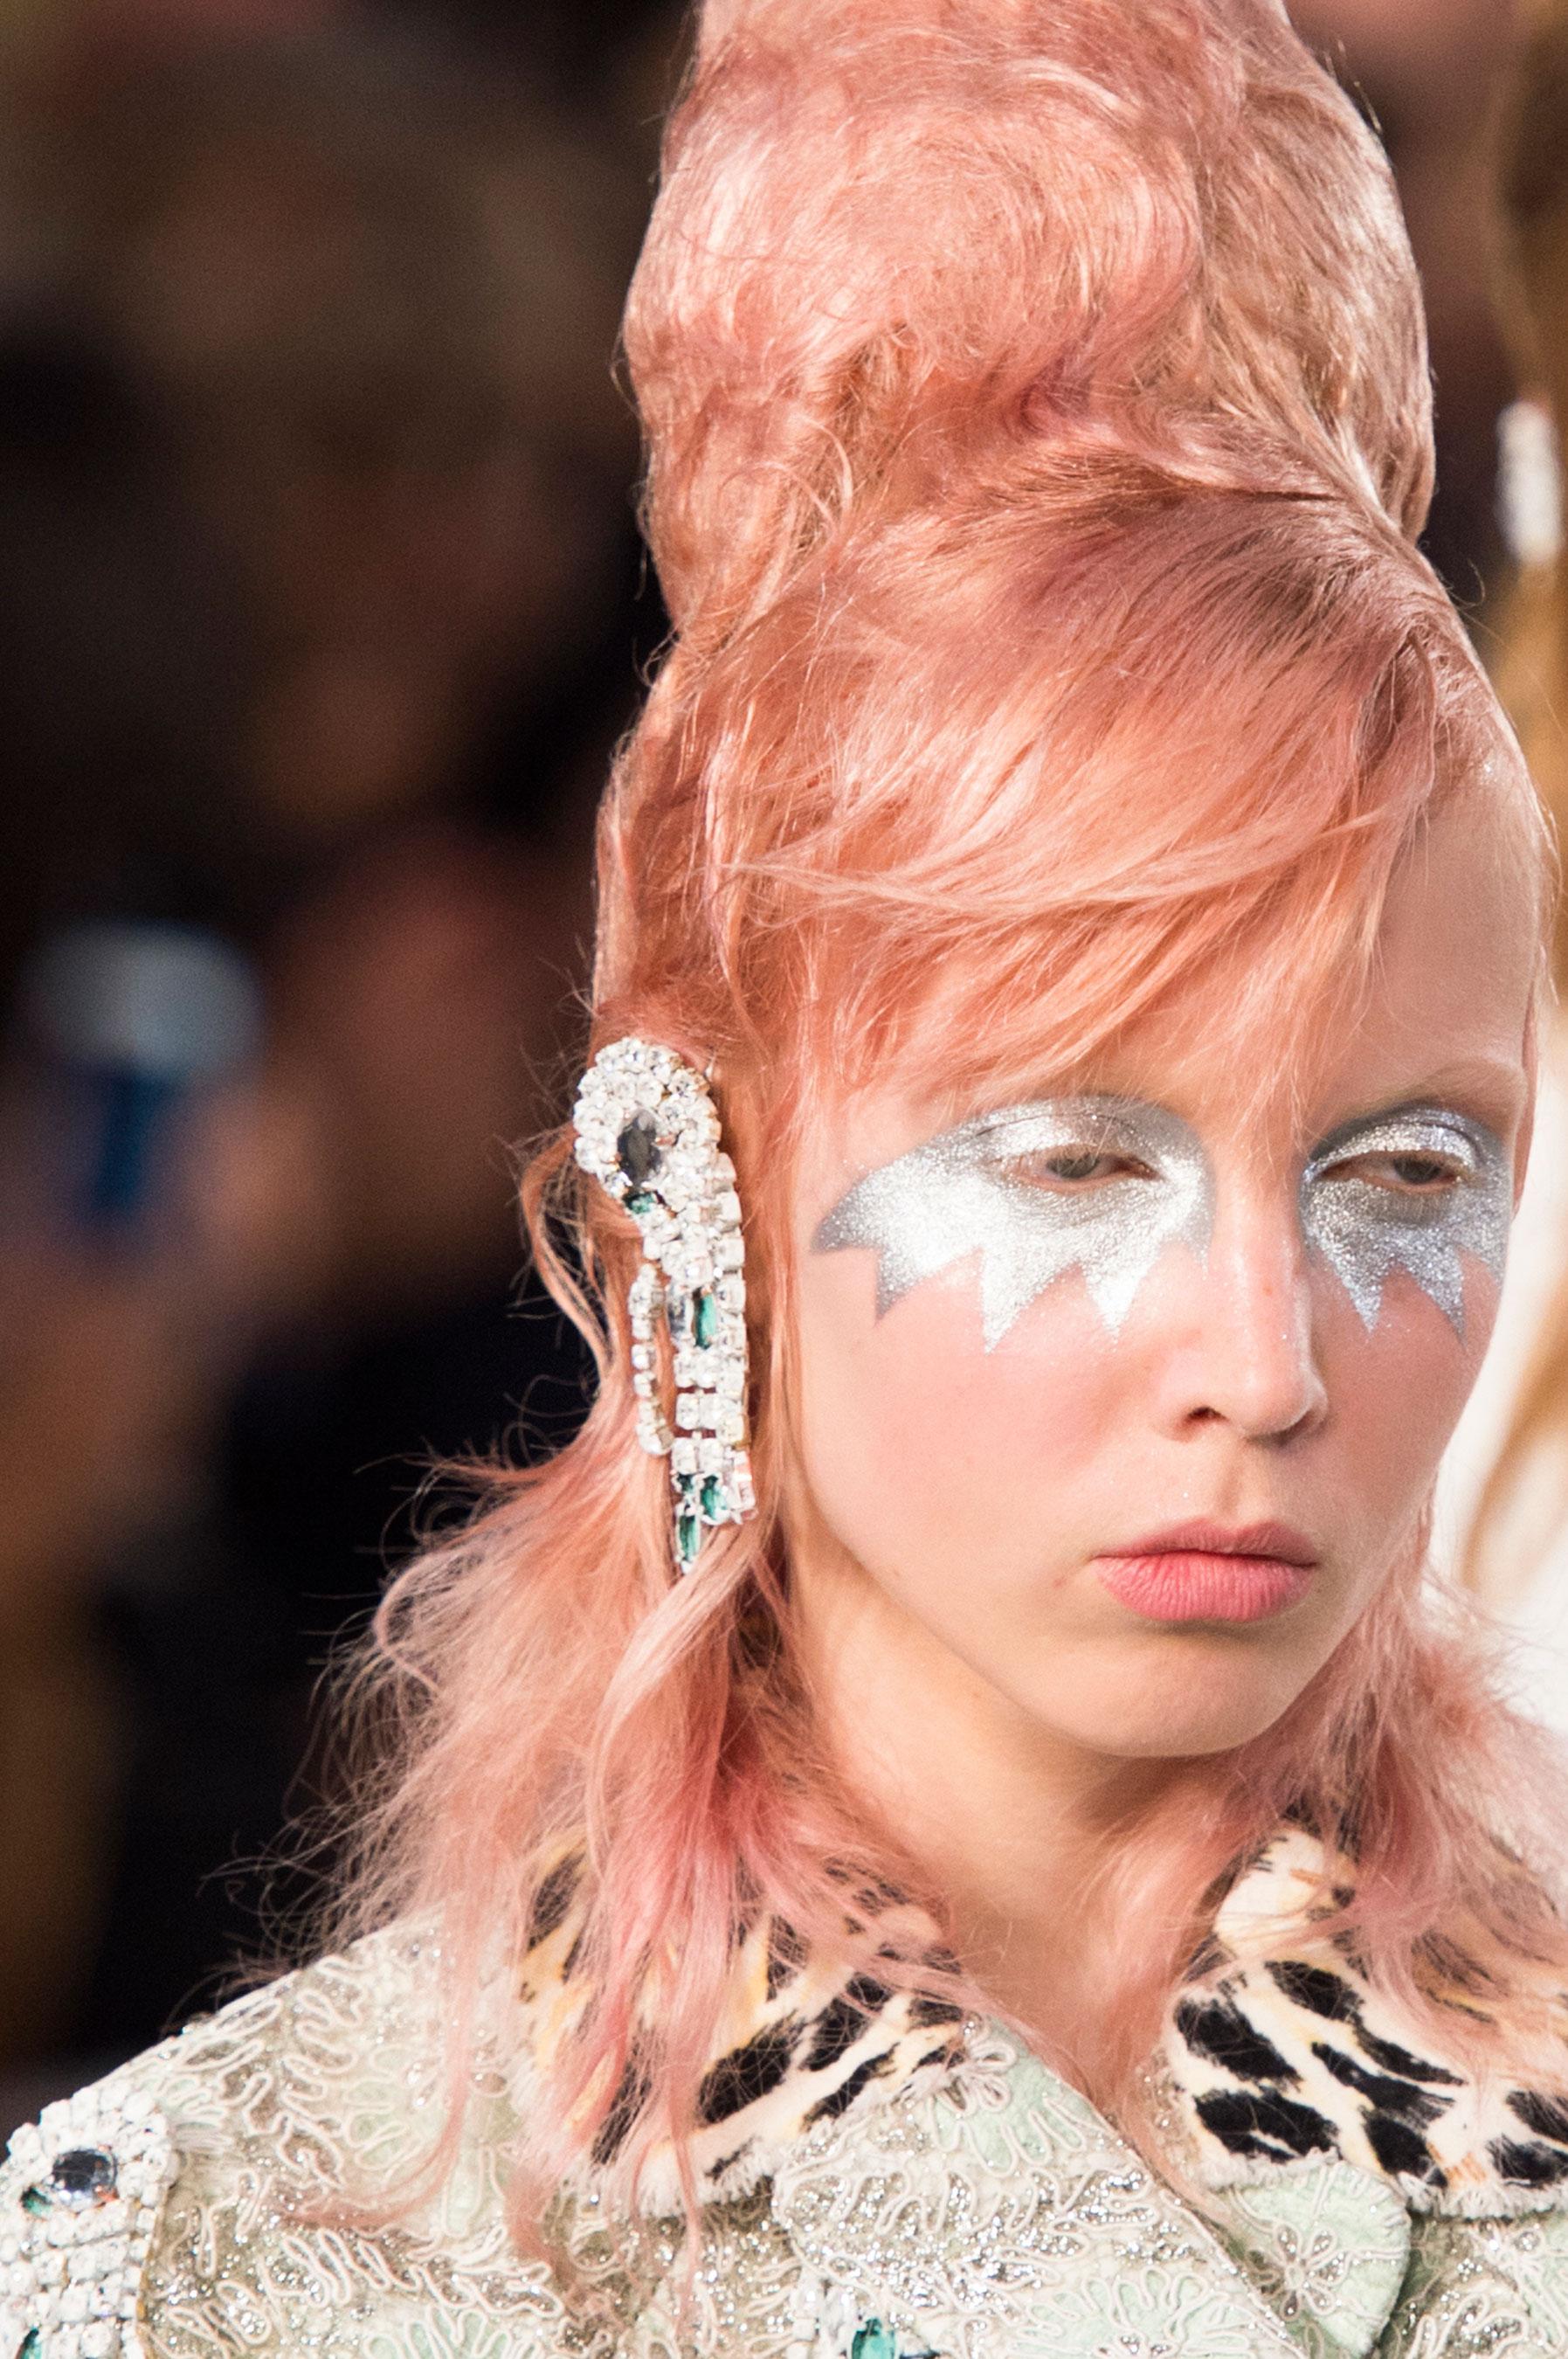 Maison-Margiela-spring-2016-runway-beauty-fashion-show-the-impression-062